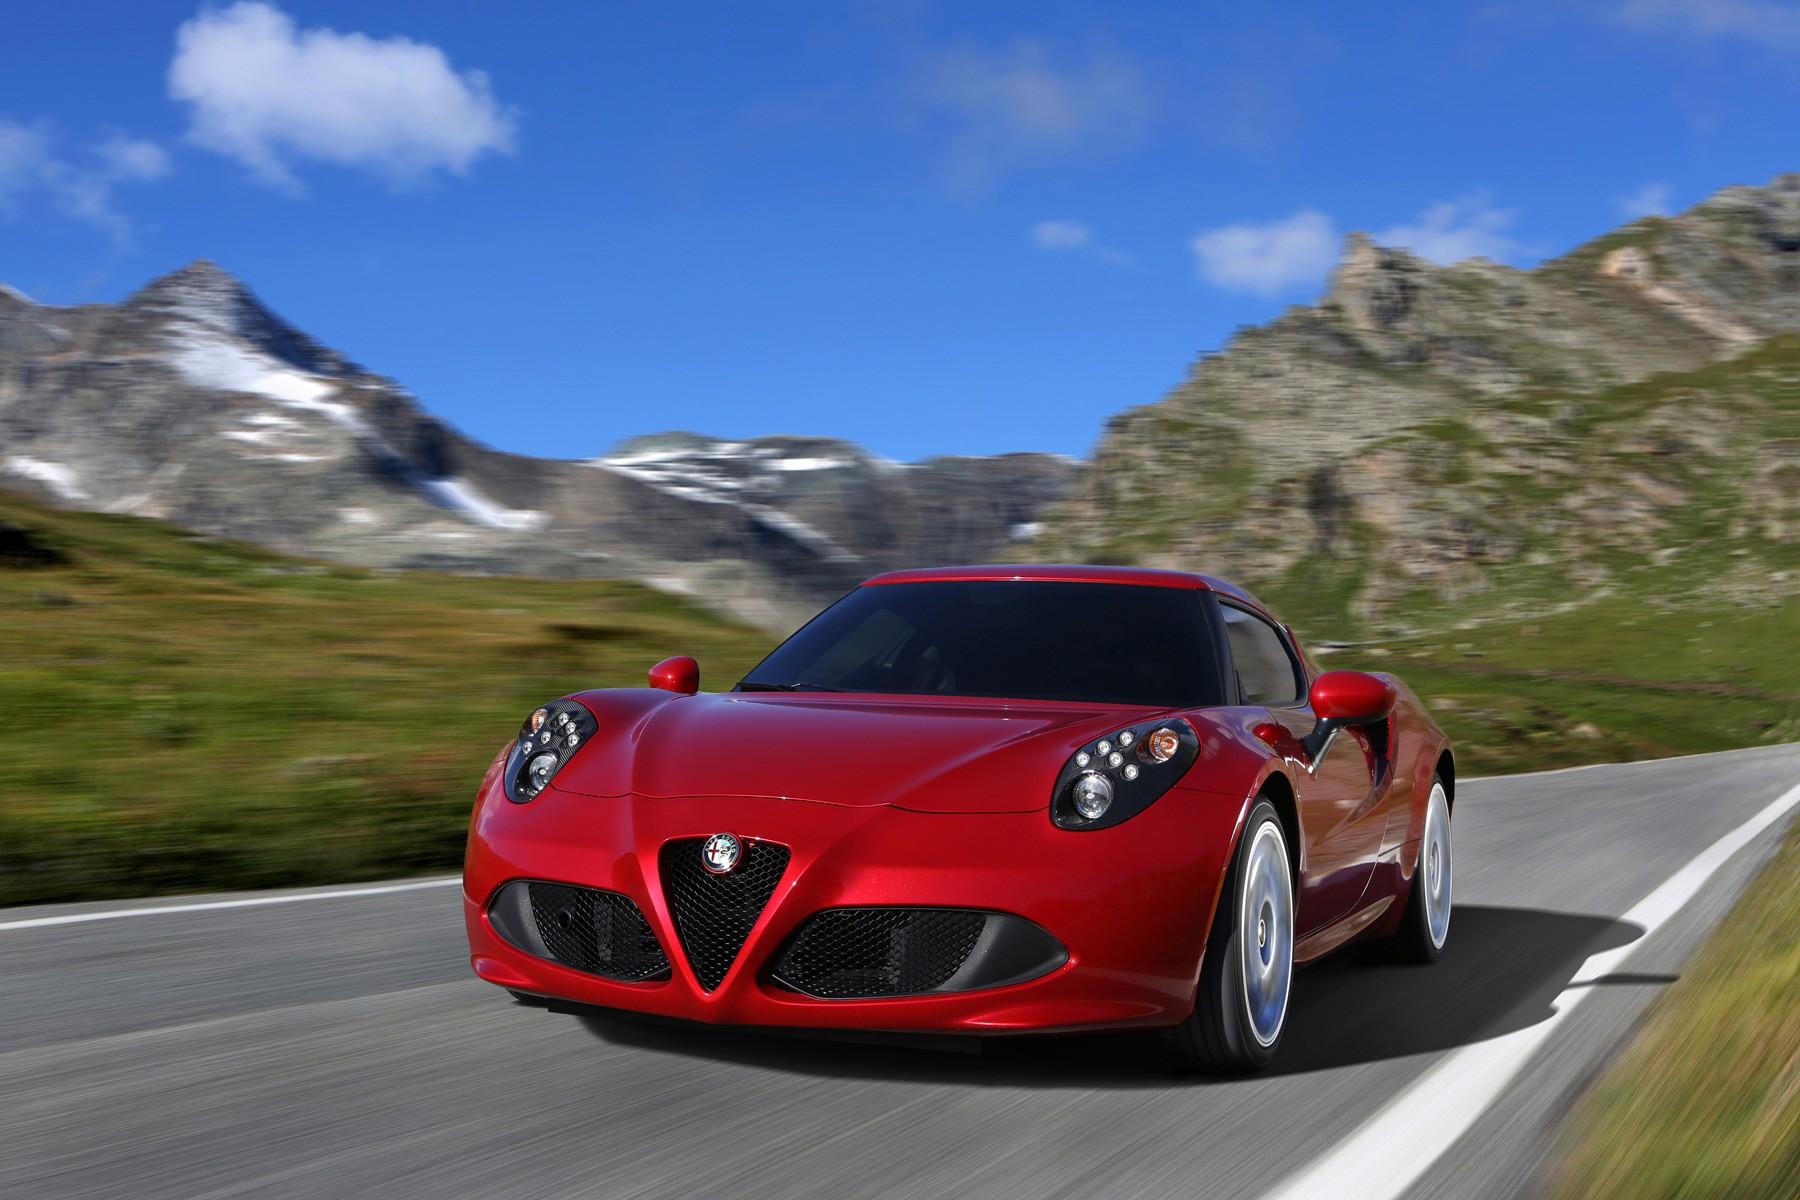 [Alfa Romeo] 4C Alfa_romeo_4c_2013_0338b-1800-1200